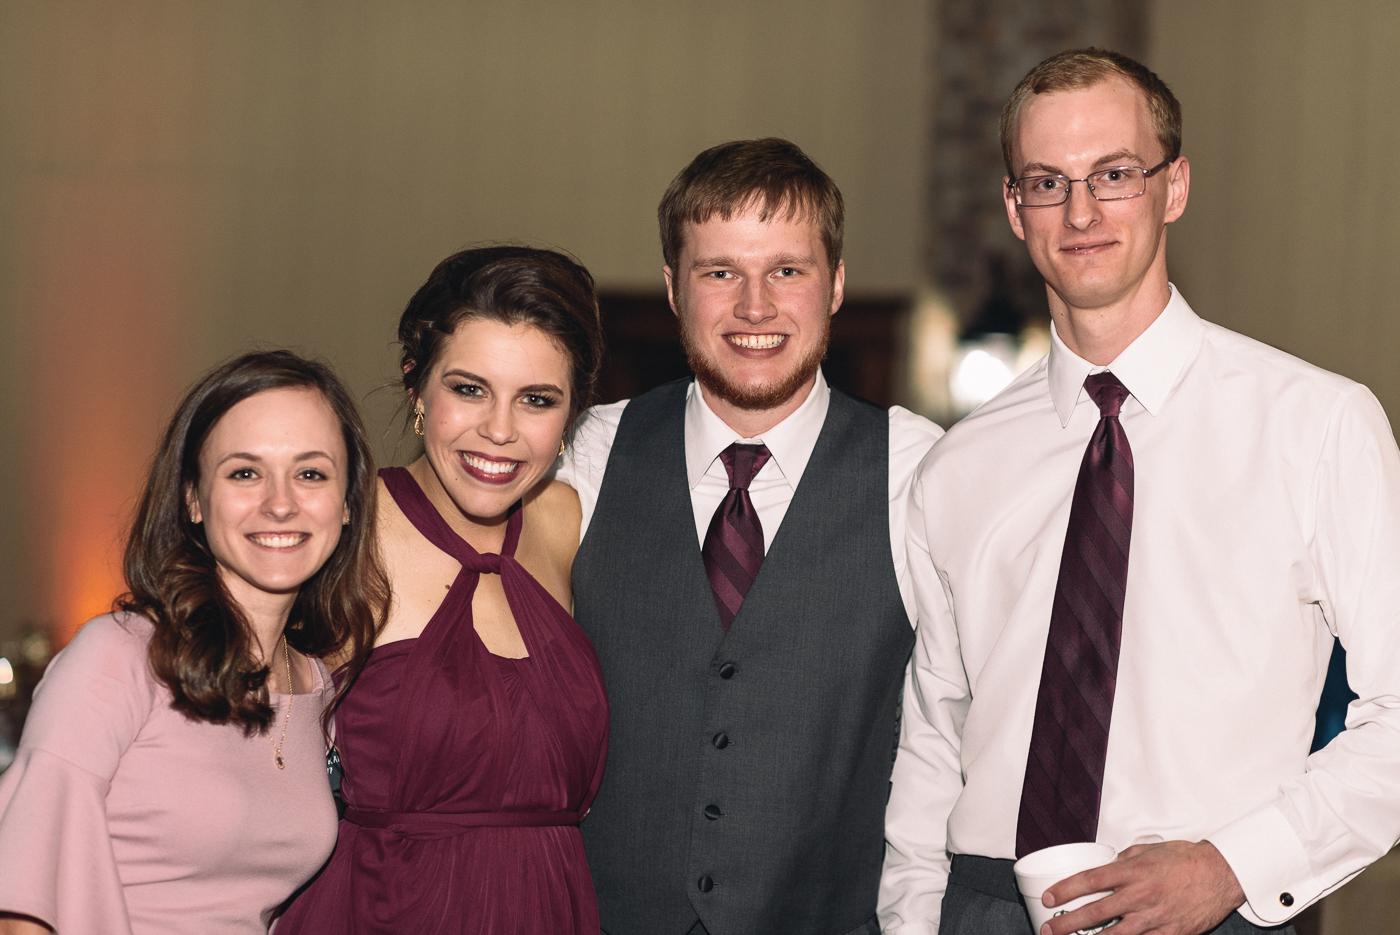 wedding reception family cousins maroon pink white